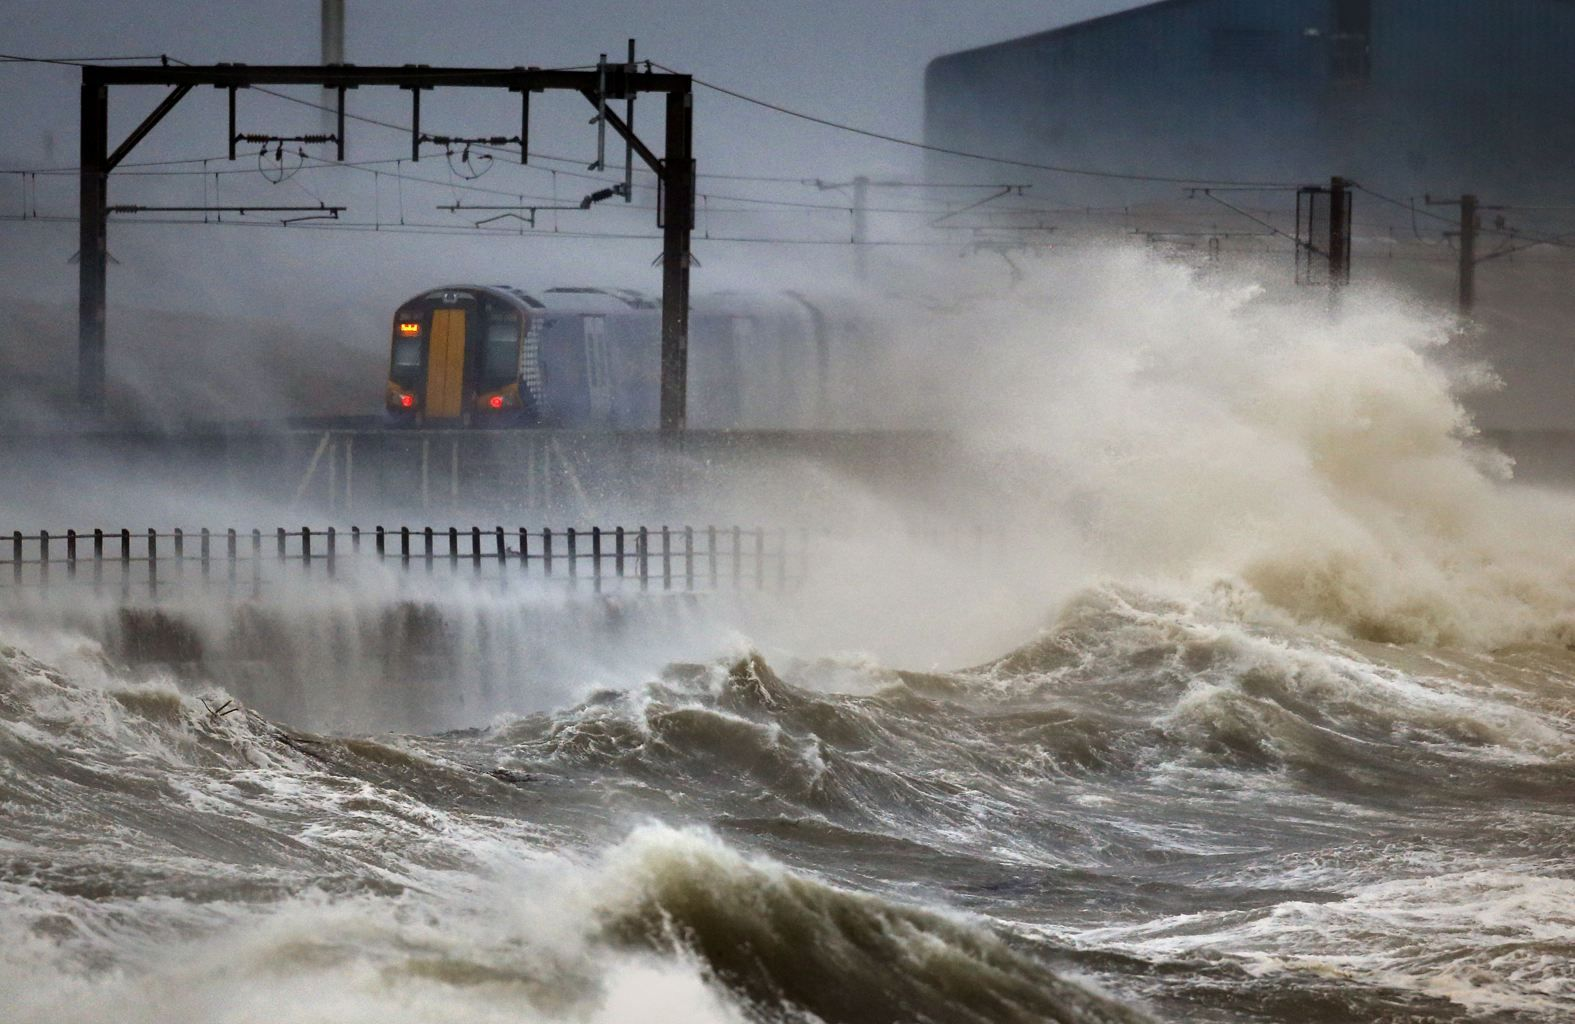 Waves Crash Against The Railway Embankment As A Train